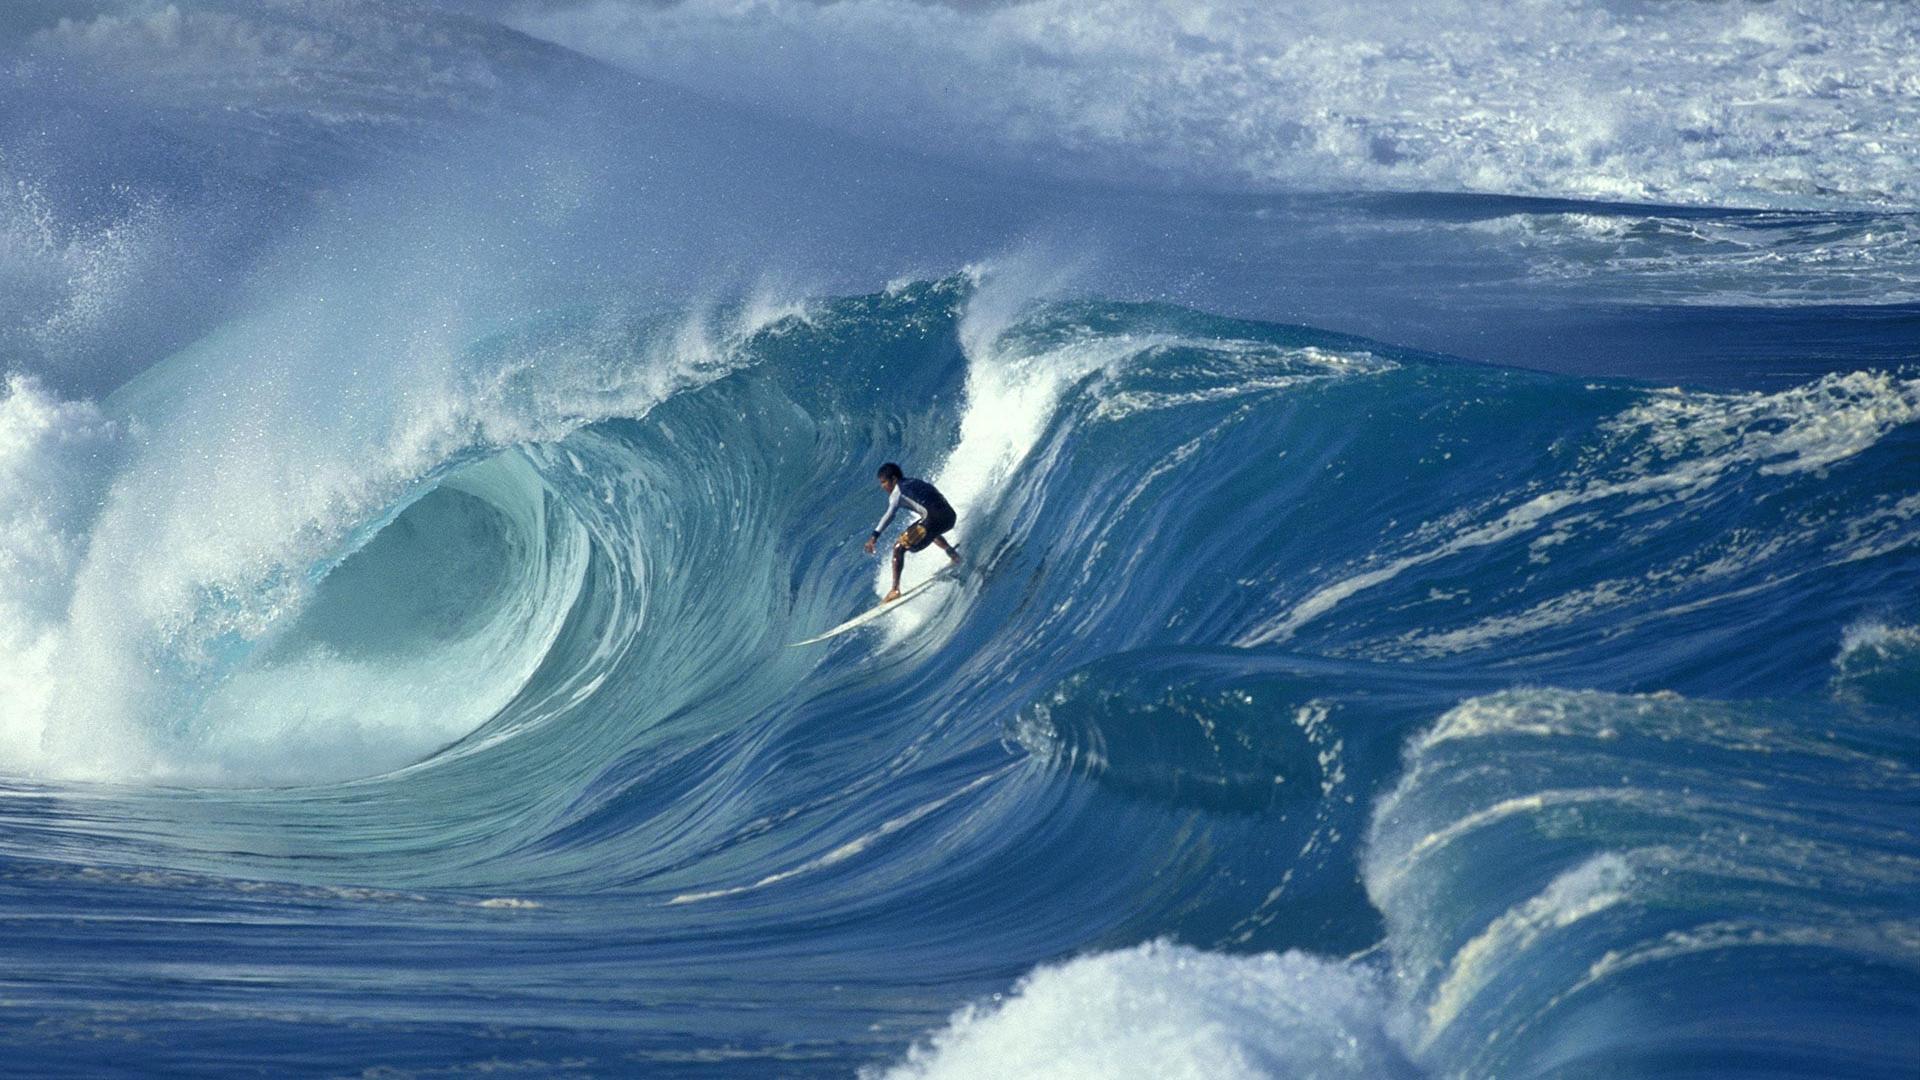 ocean wave desktop backgrounds hd wallpaper background